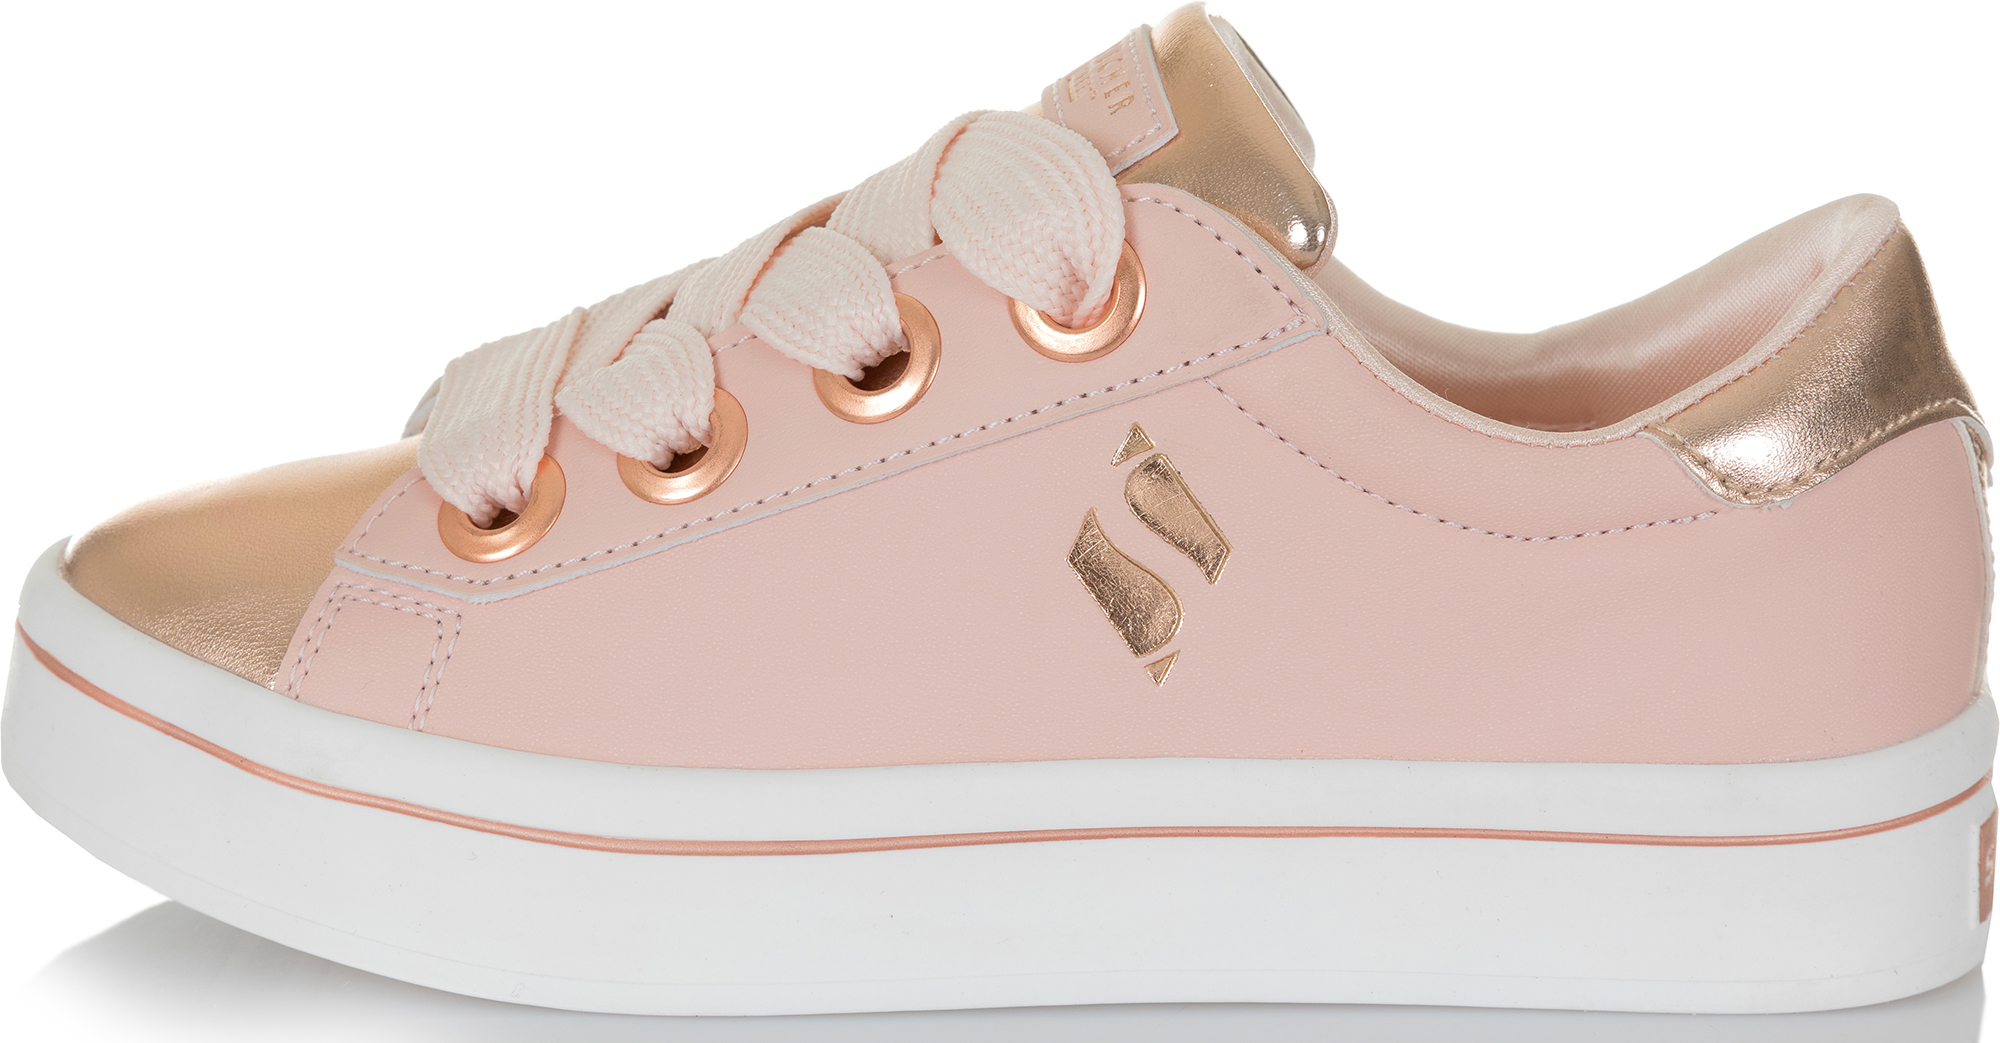 Skechers Кеды для девочек Hi-Lite-Medal Toes, размер 38